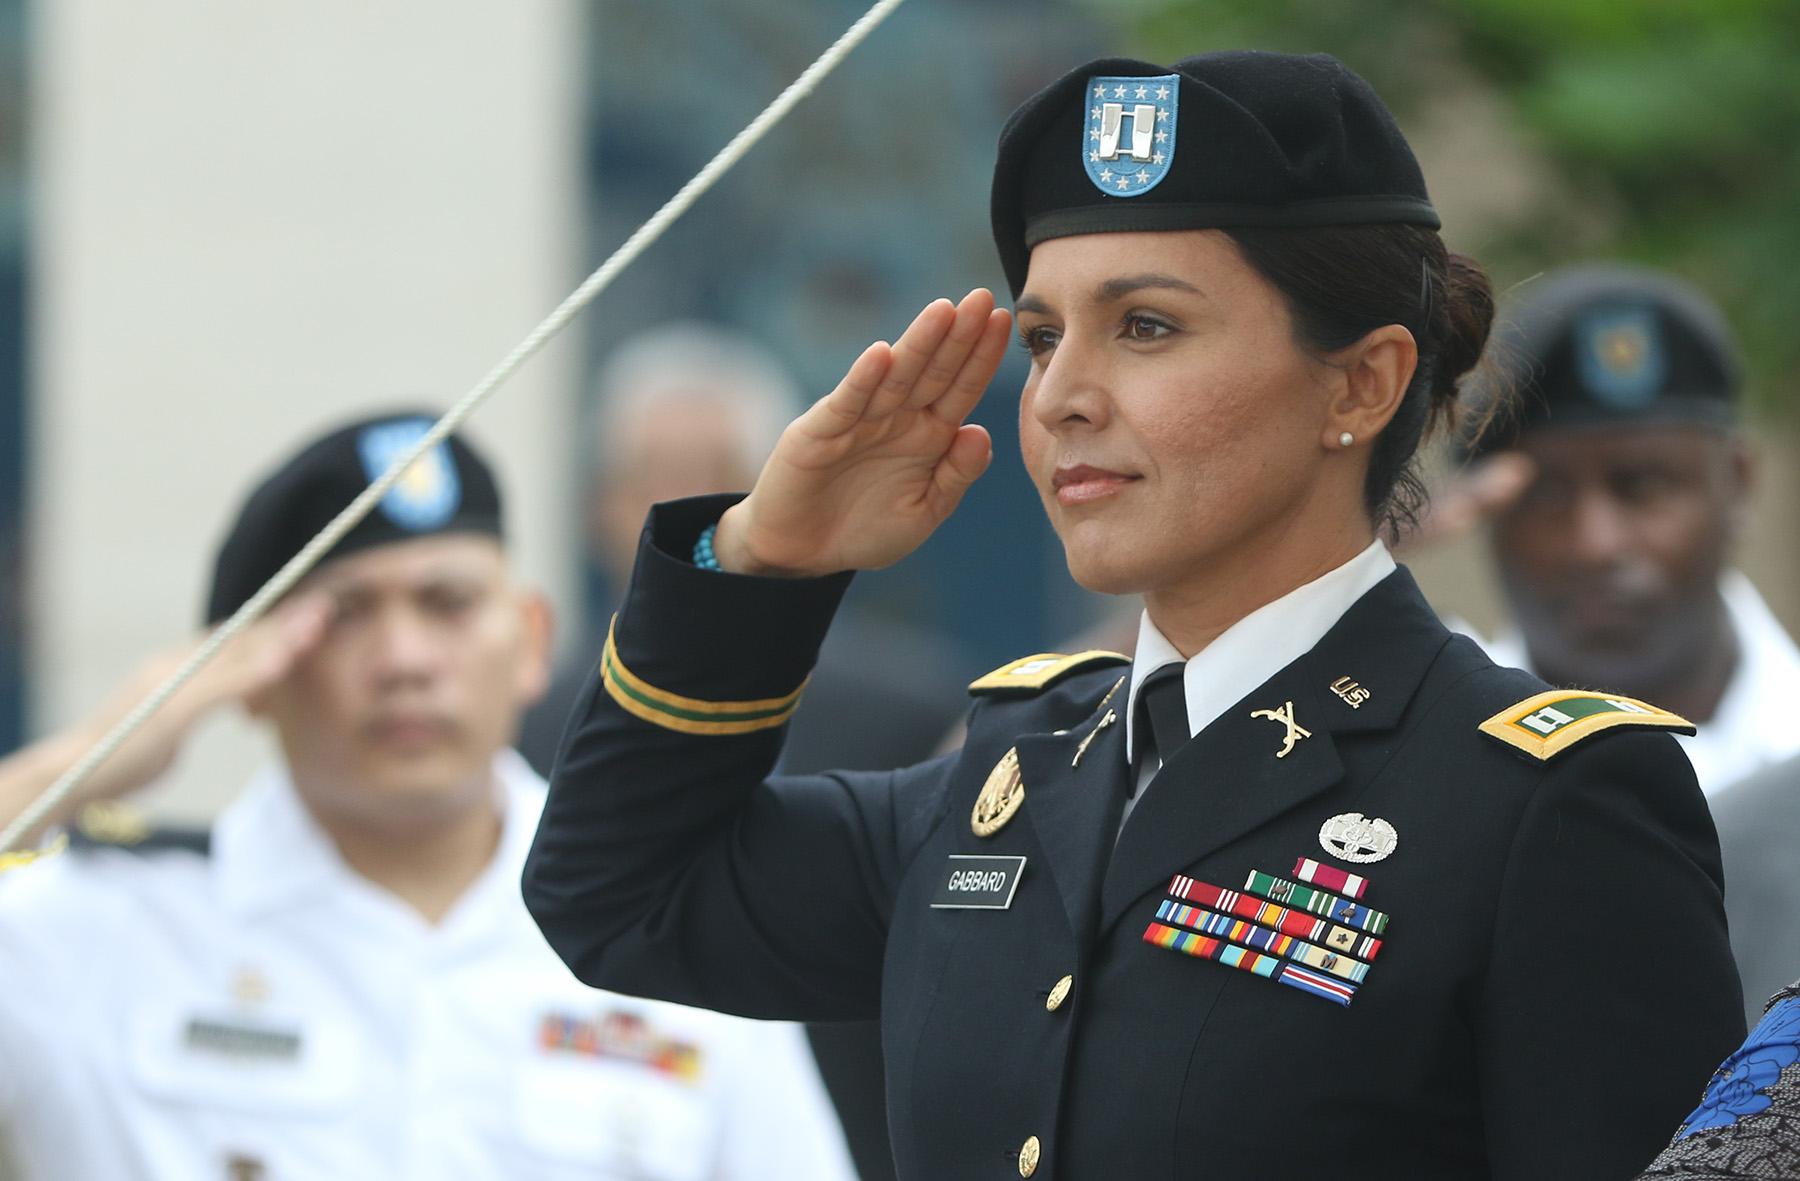 Thanks for Naked women in uniform military